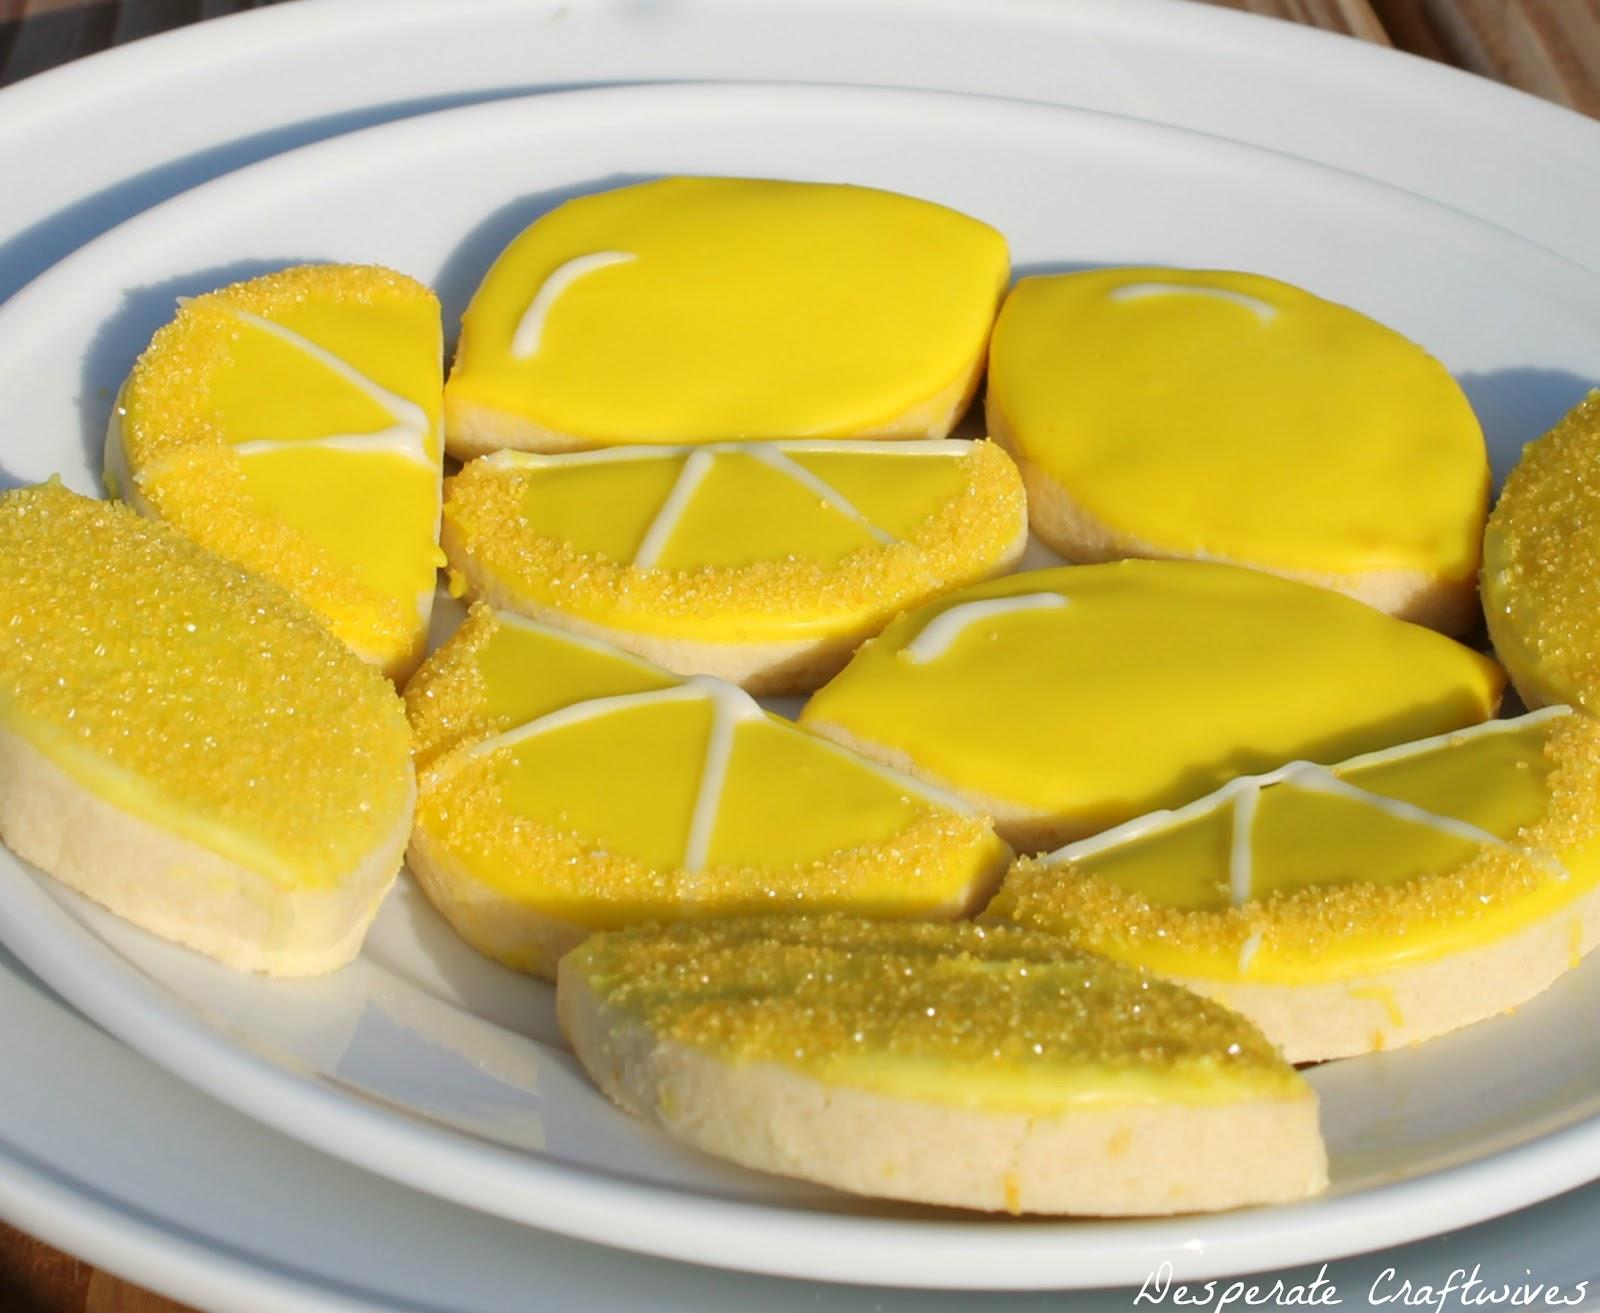 Desperate craftwives lemonade birthday party for Lemon shaped lemonade stand